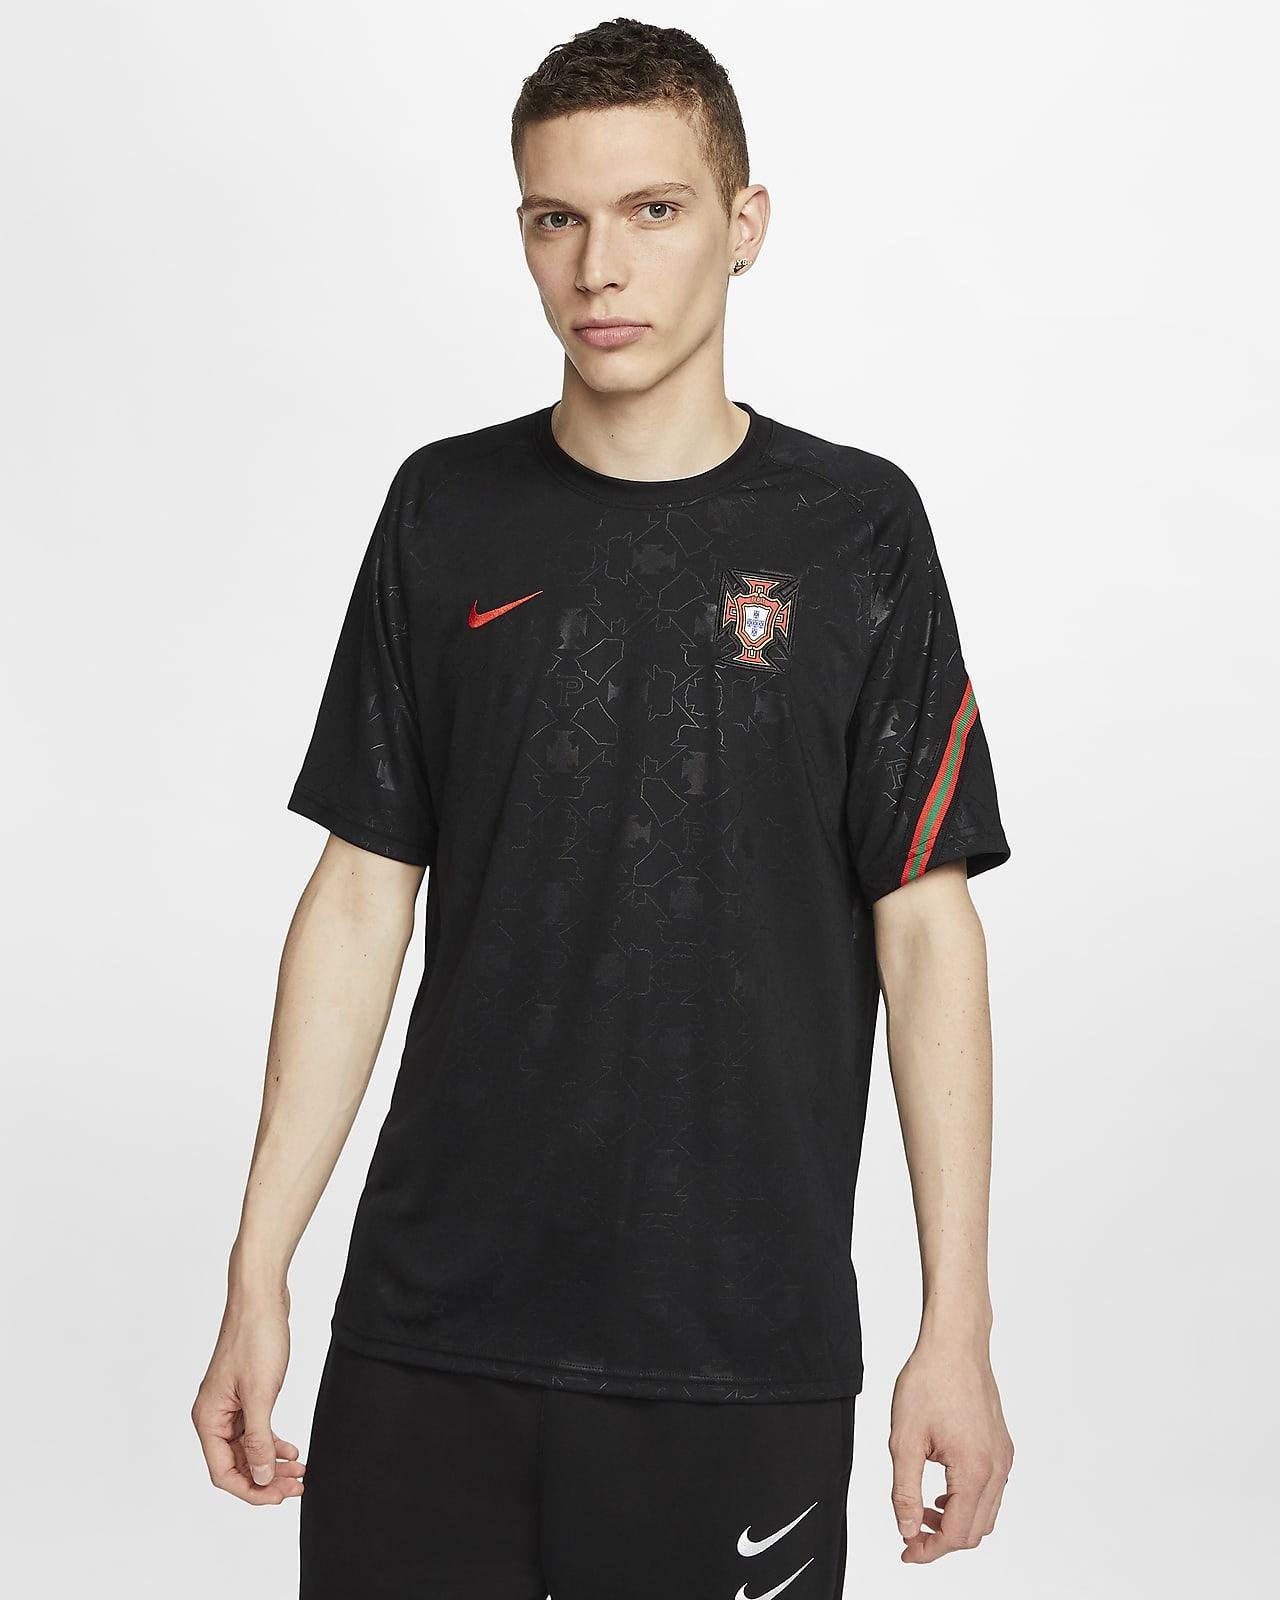 Portugal Men's Short-Sleeve Football Top